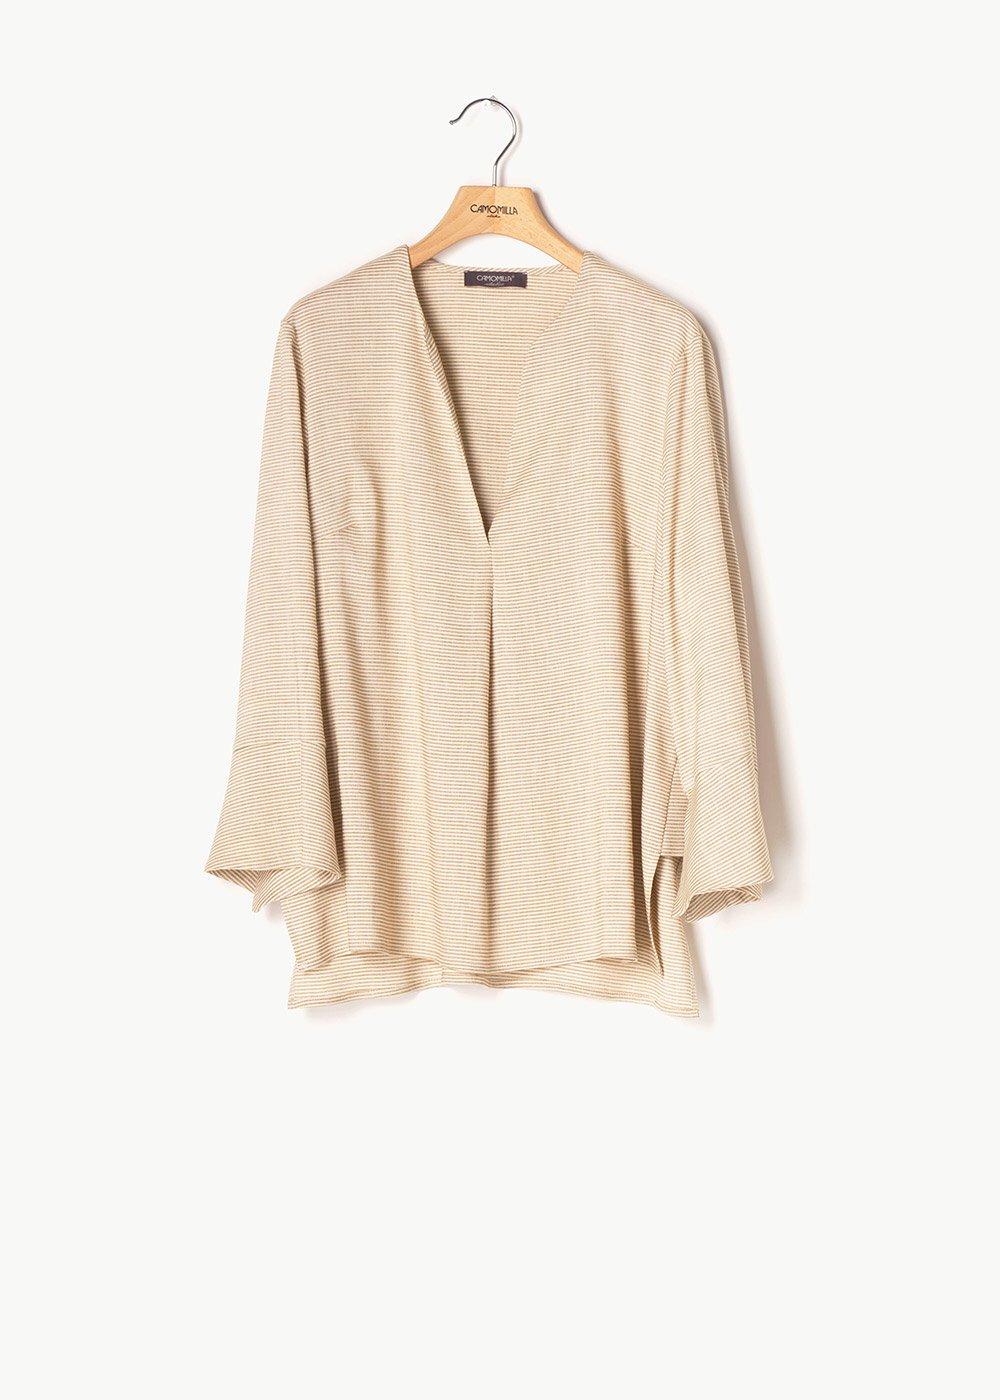 Selia V-neck t-shirt - L.beige \ Whte Stripes - Woman